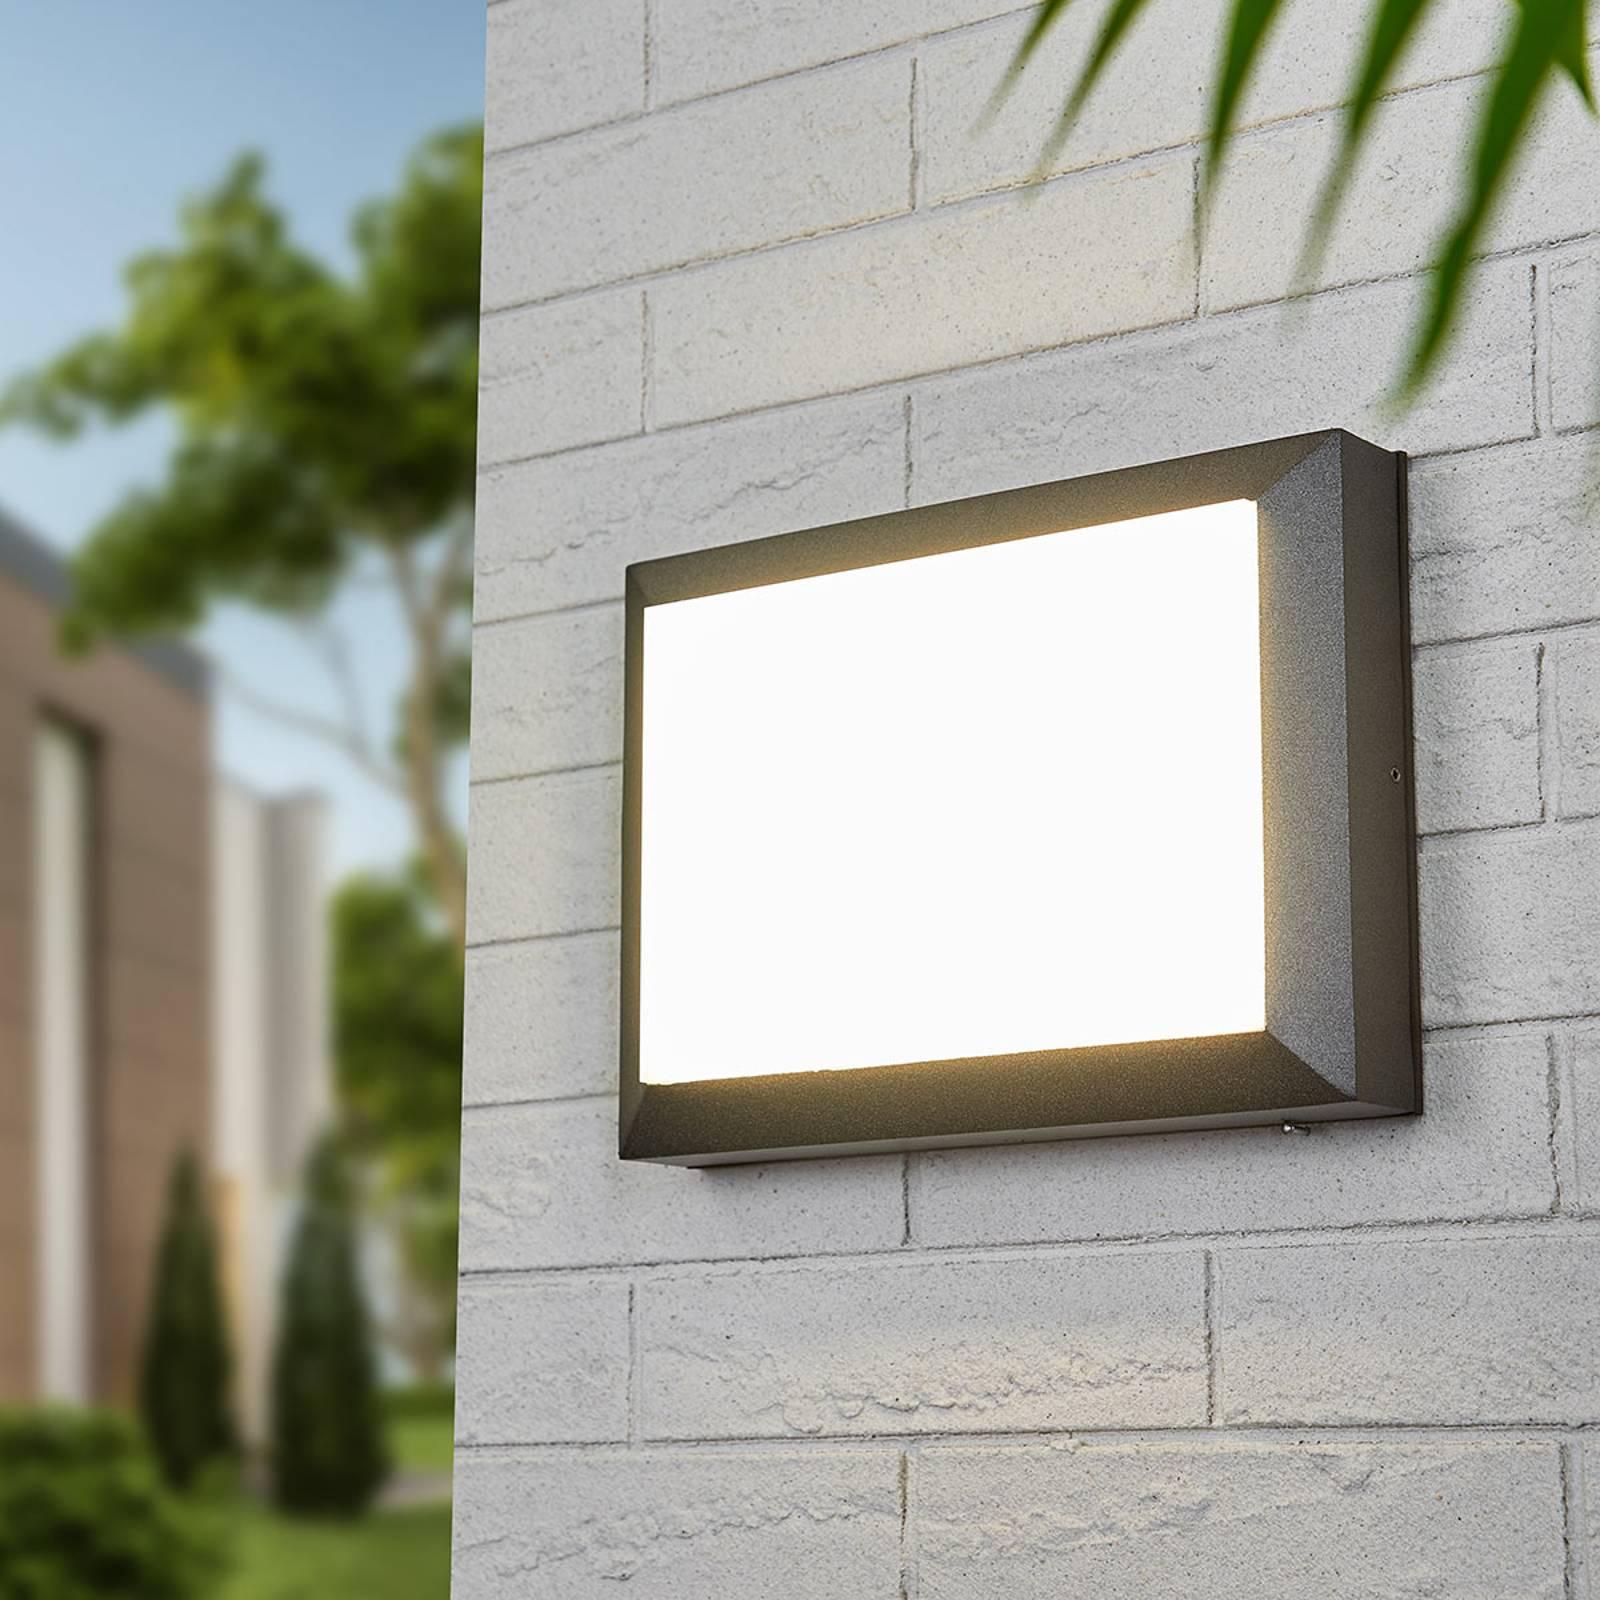 Applique LED da esterni Kiran paralume antiurto